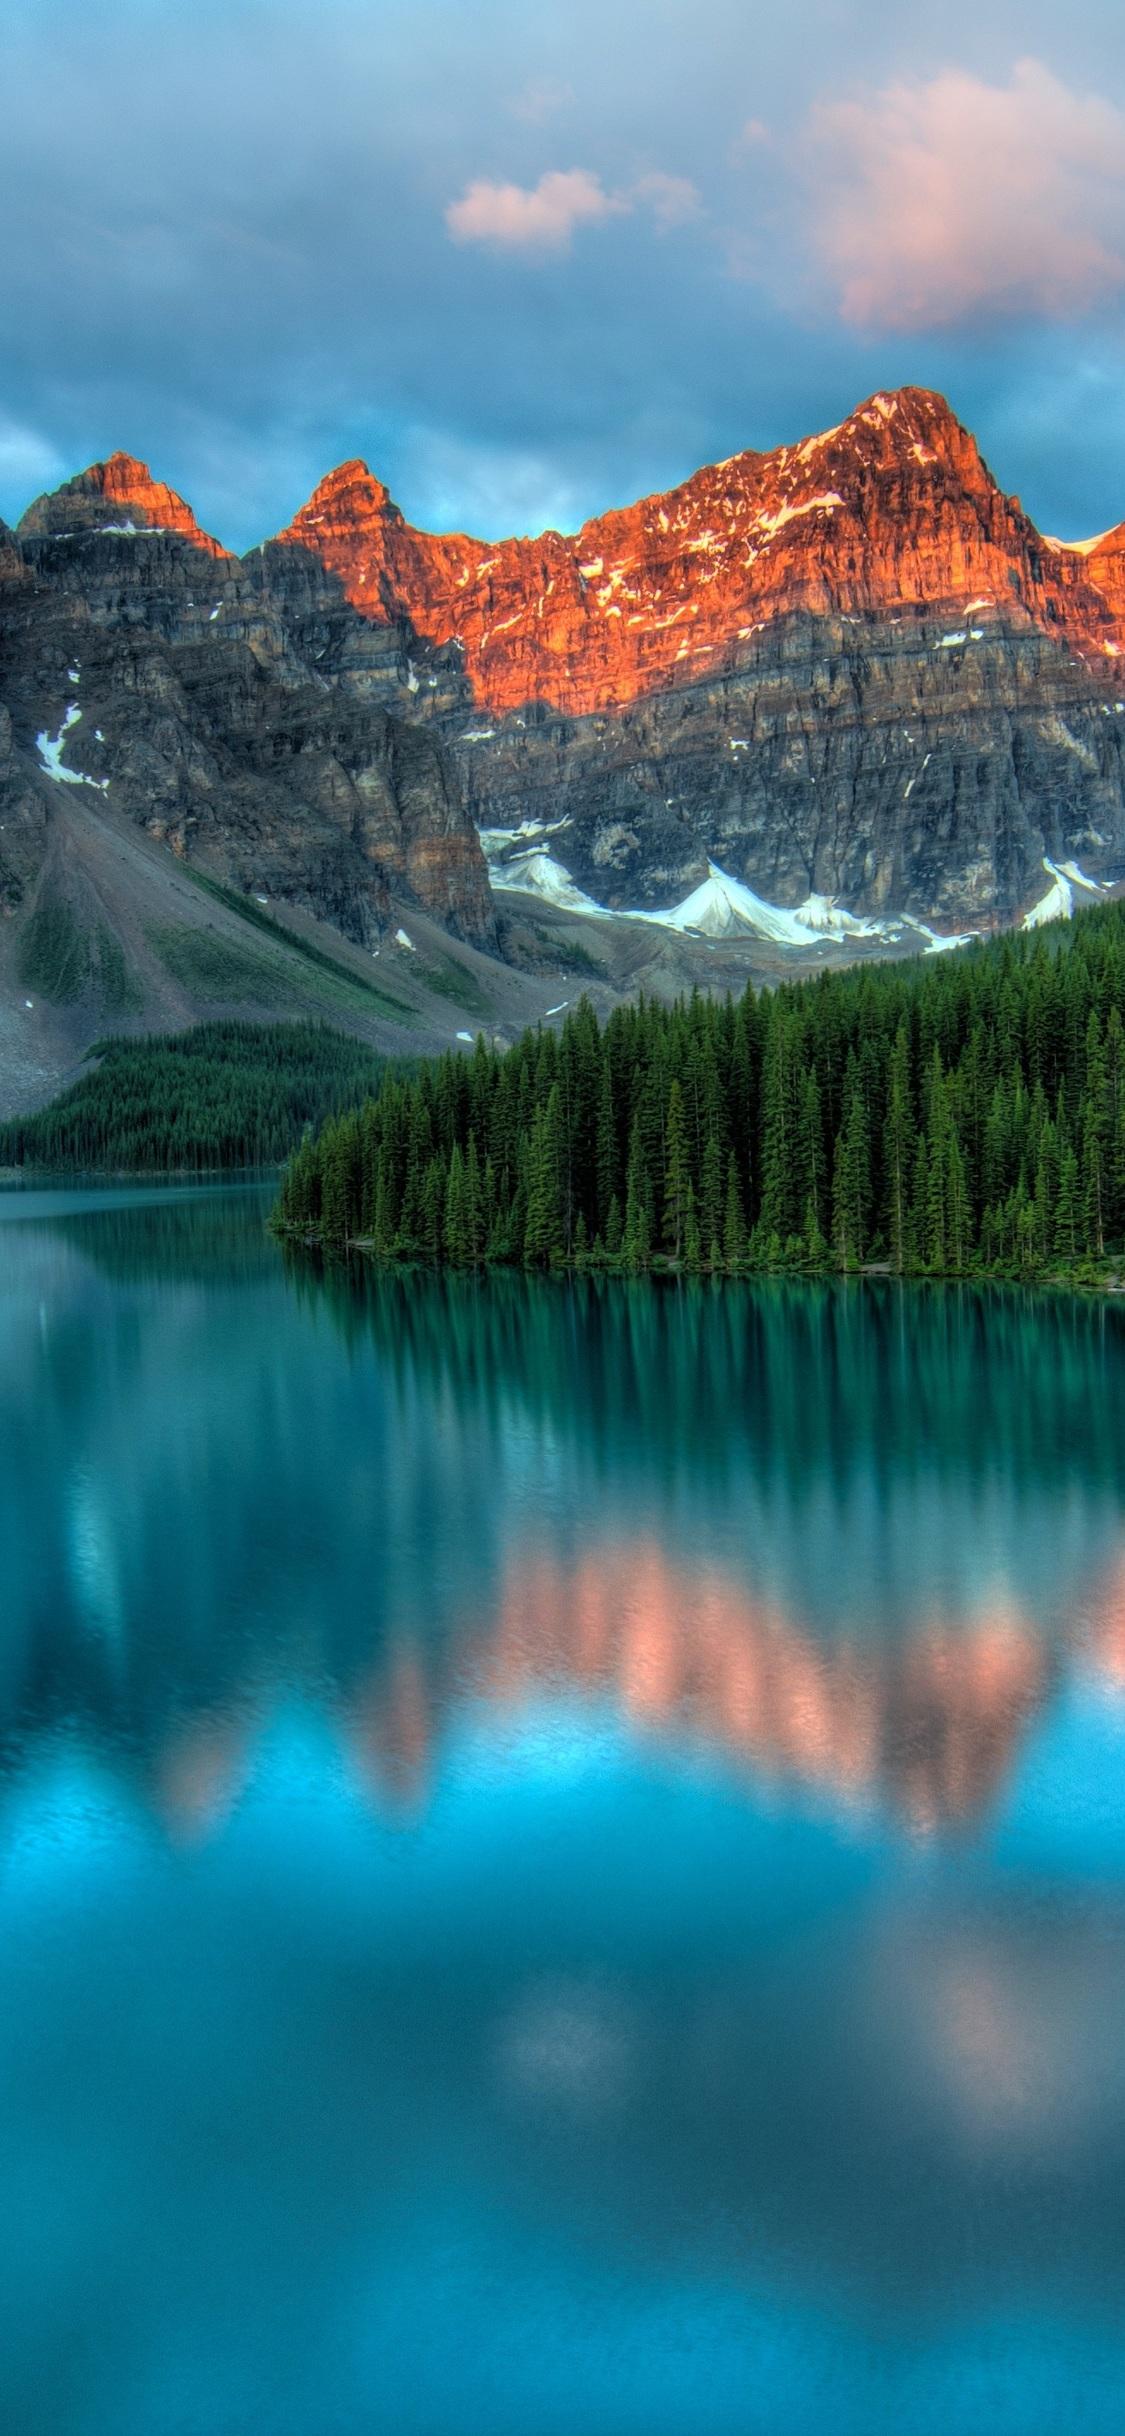 Alberta Canada Moraine Lake 1727798 Hd Wallpaper